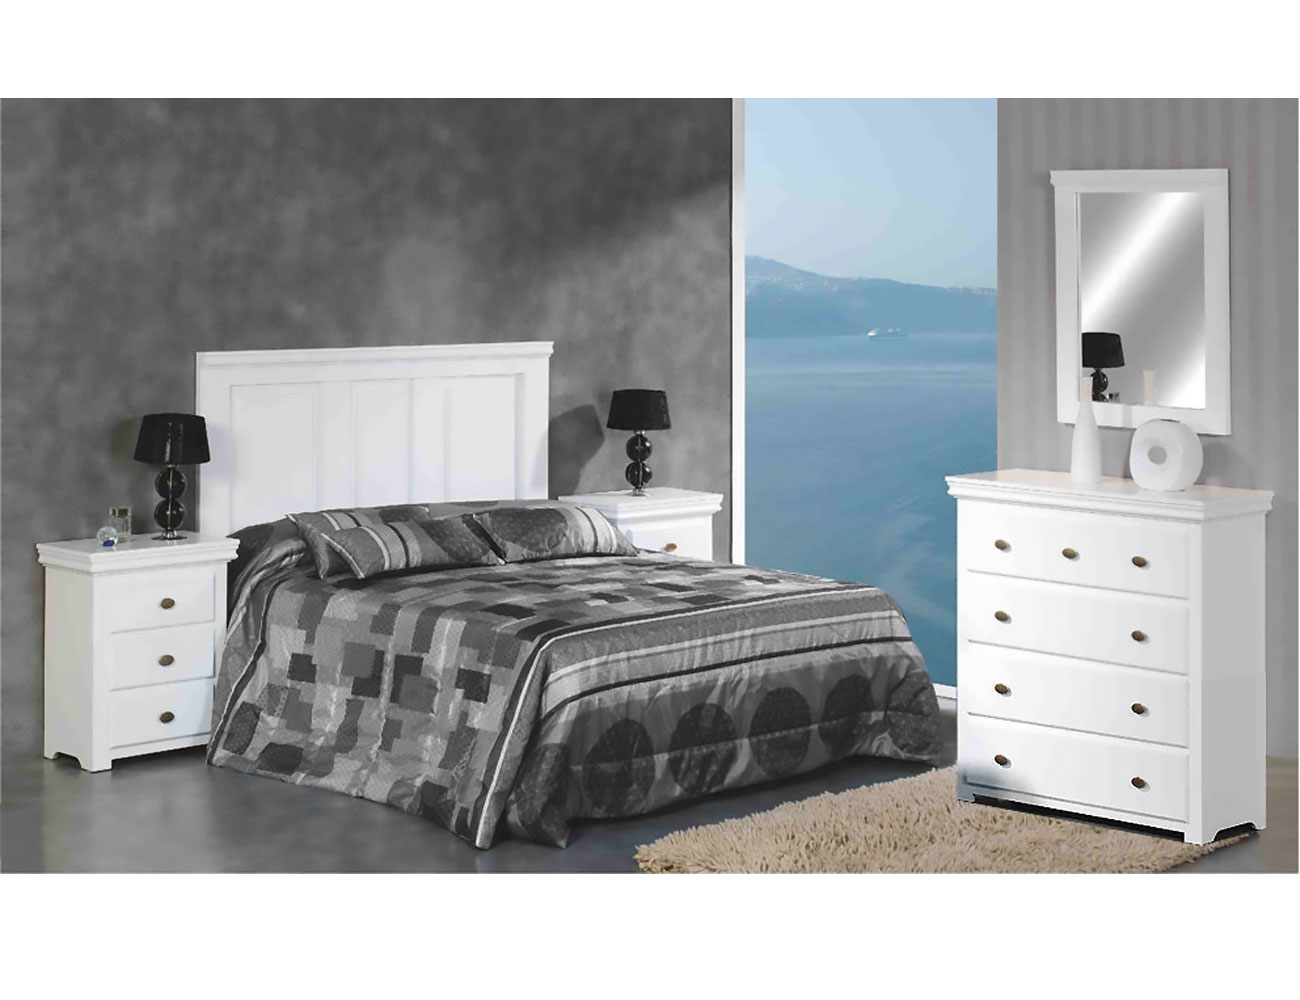 Dormitorio matrimonio comoda 5 c madera dm lacado blanco11